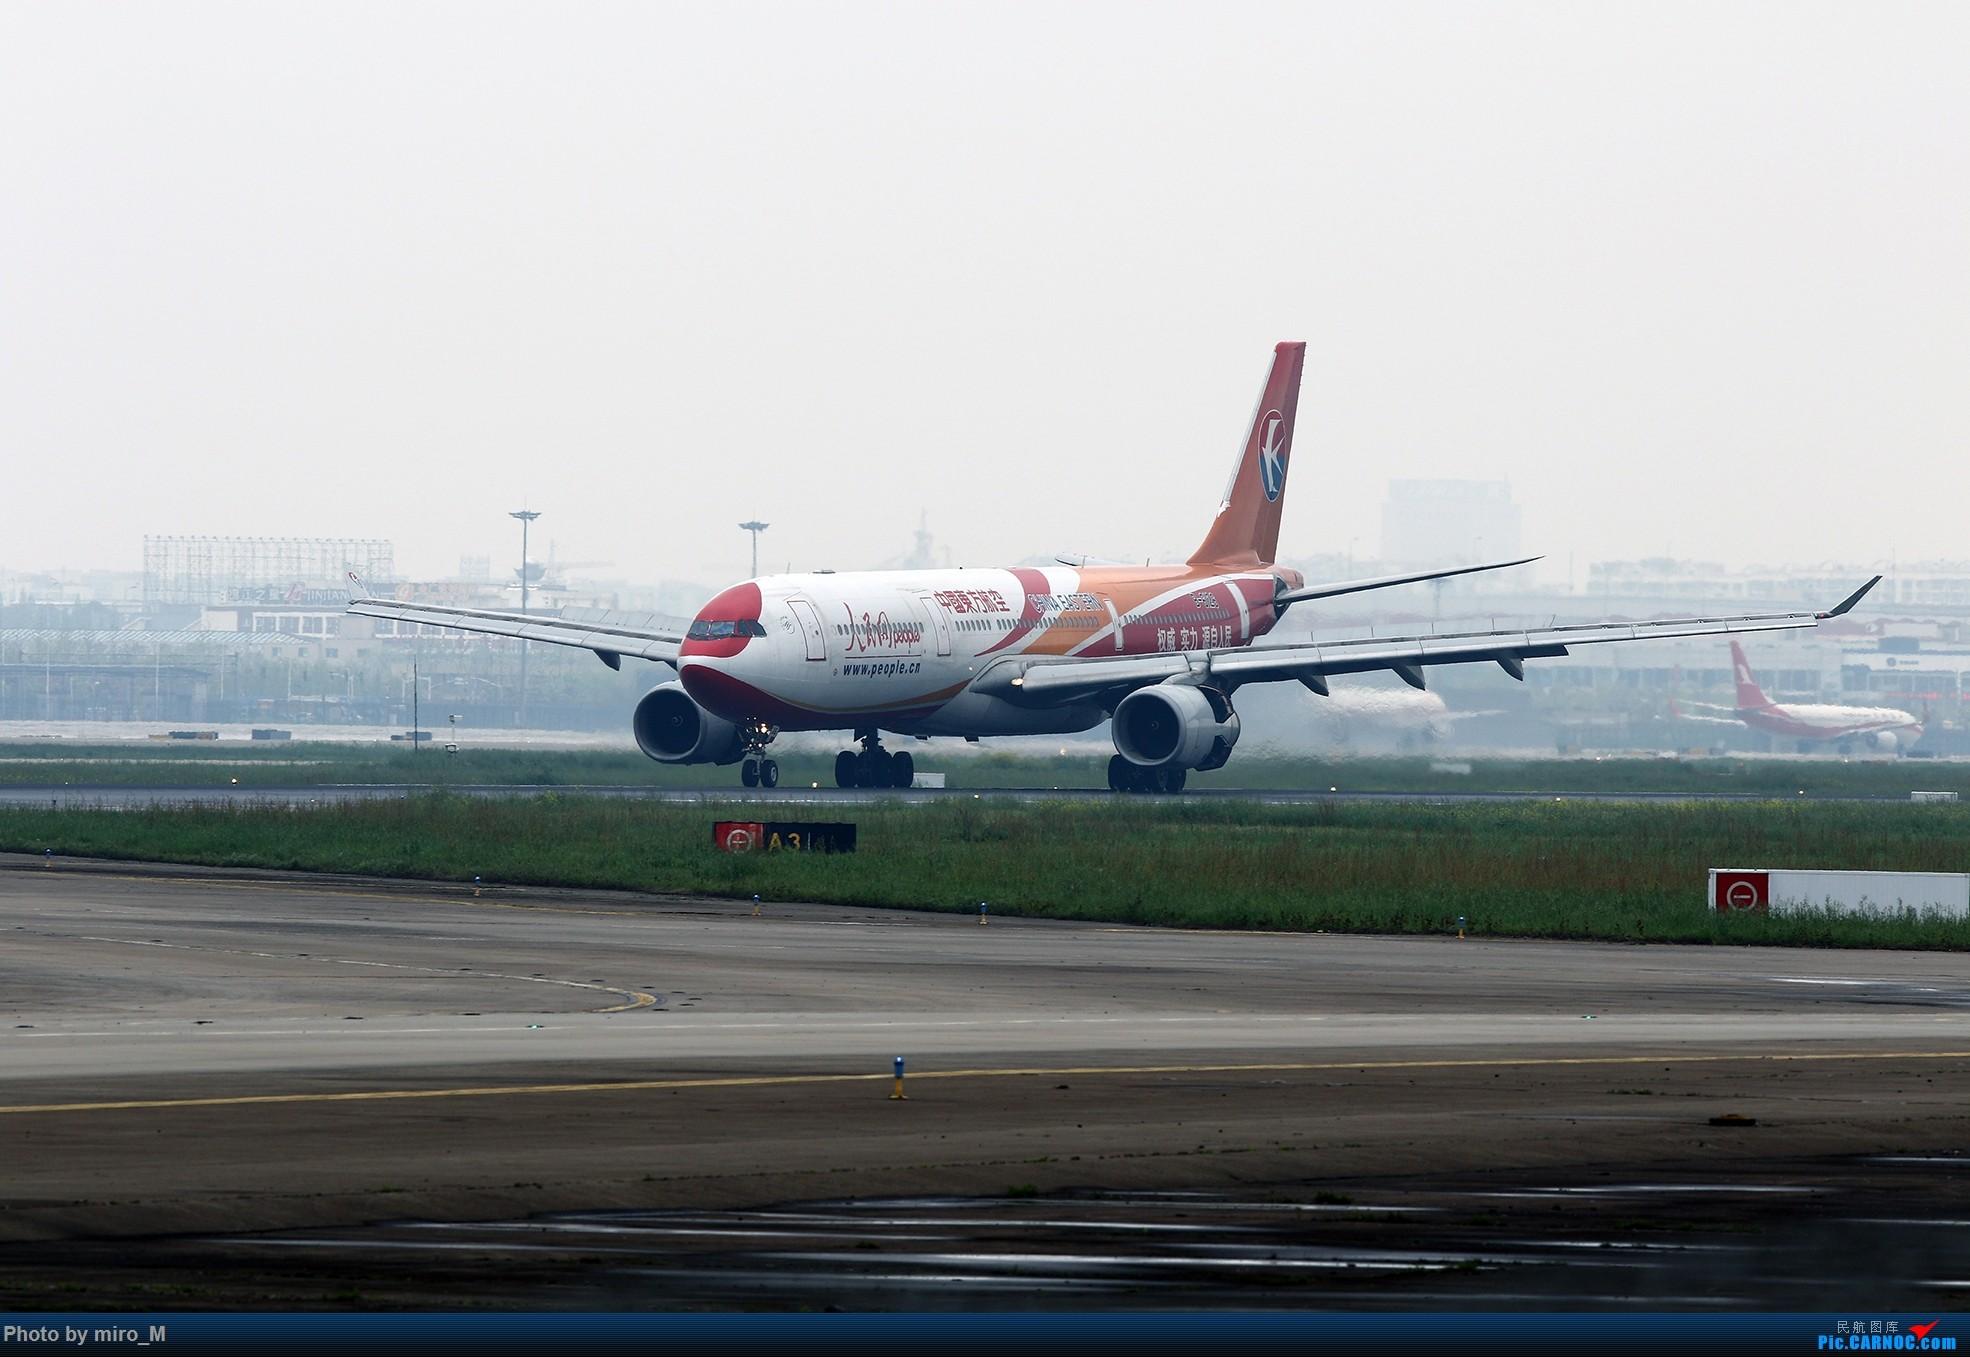 Re:[原创]烂天普通货………………虹桥412-414拍机合集 AIRBUS A330-300 B-6126 中国上海虹桥国际机场